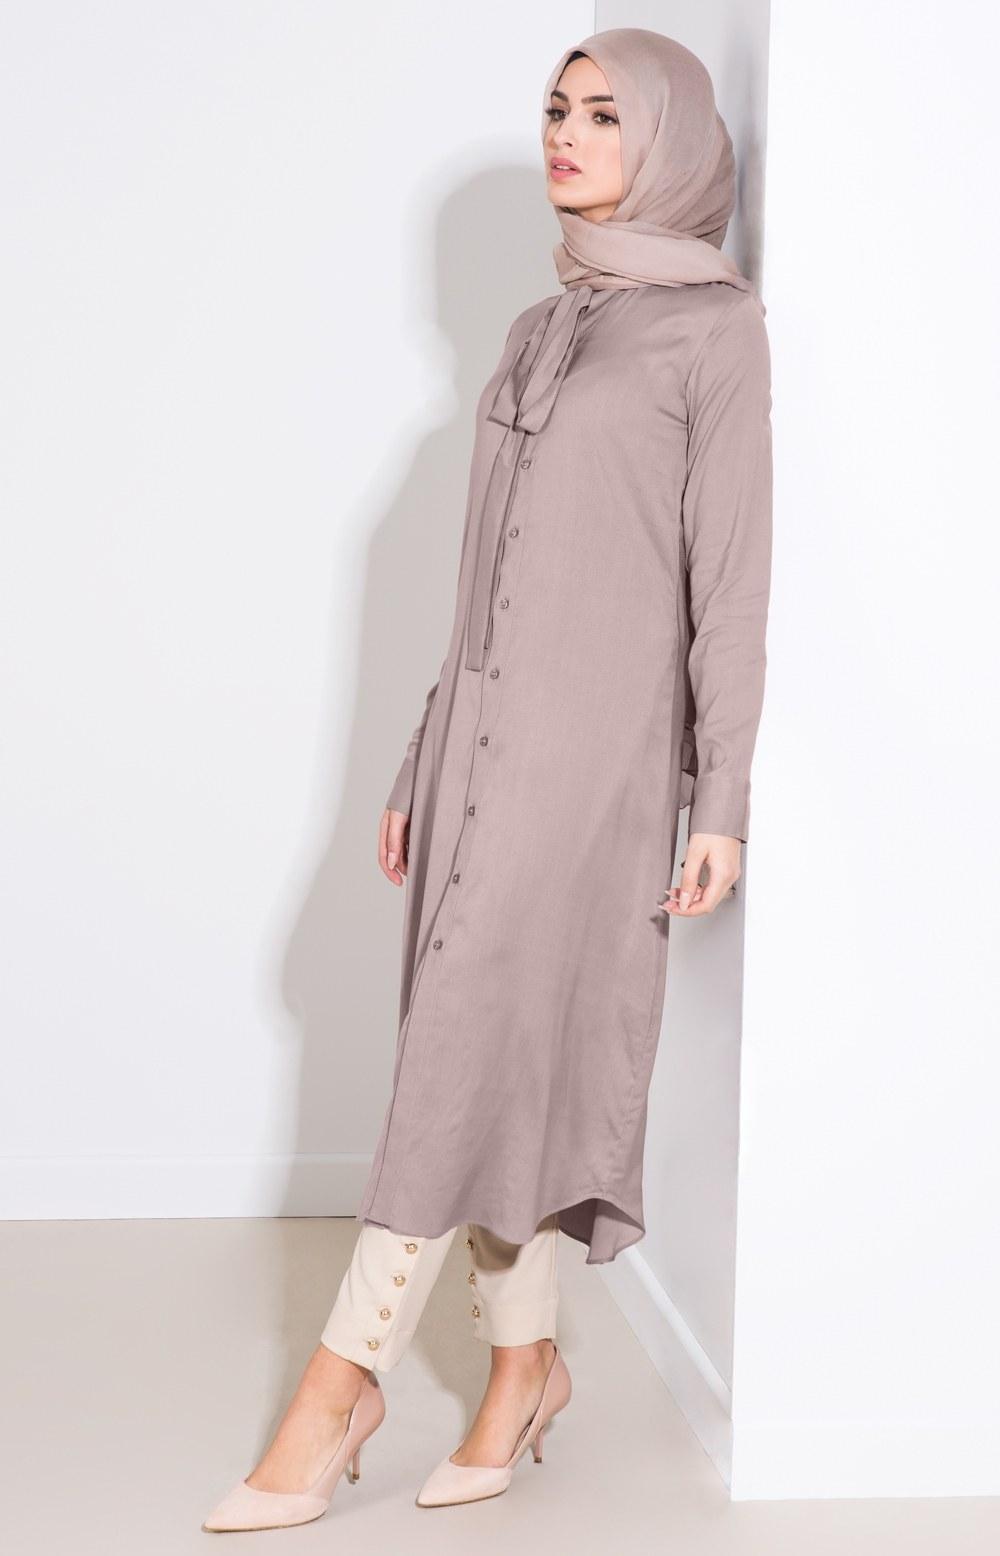 Bentuk Baju Lebaran Thn Ini Xtd6 25 Trend Model Baju Muslim Lebaran 2018 Simple & Modis